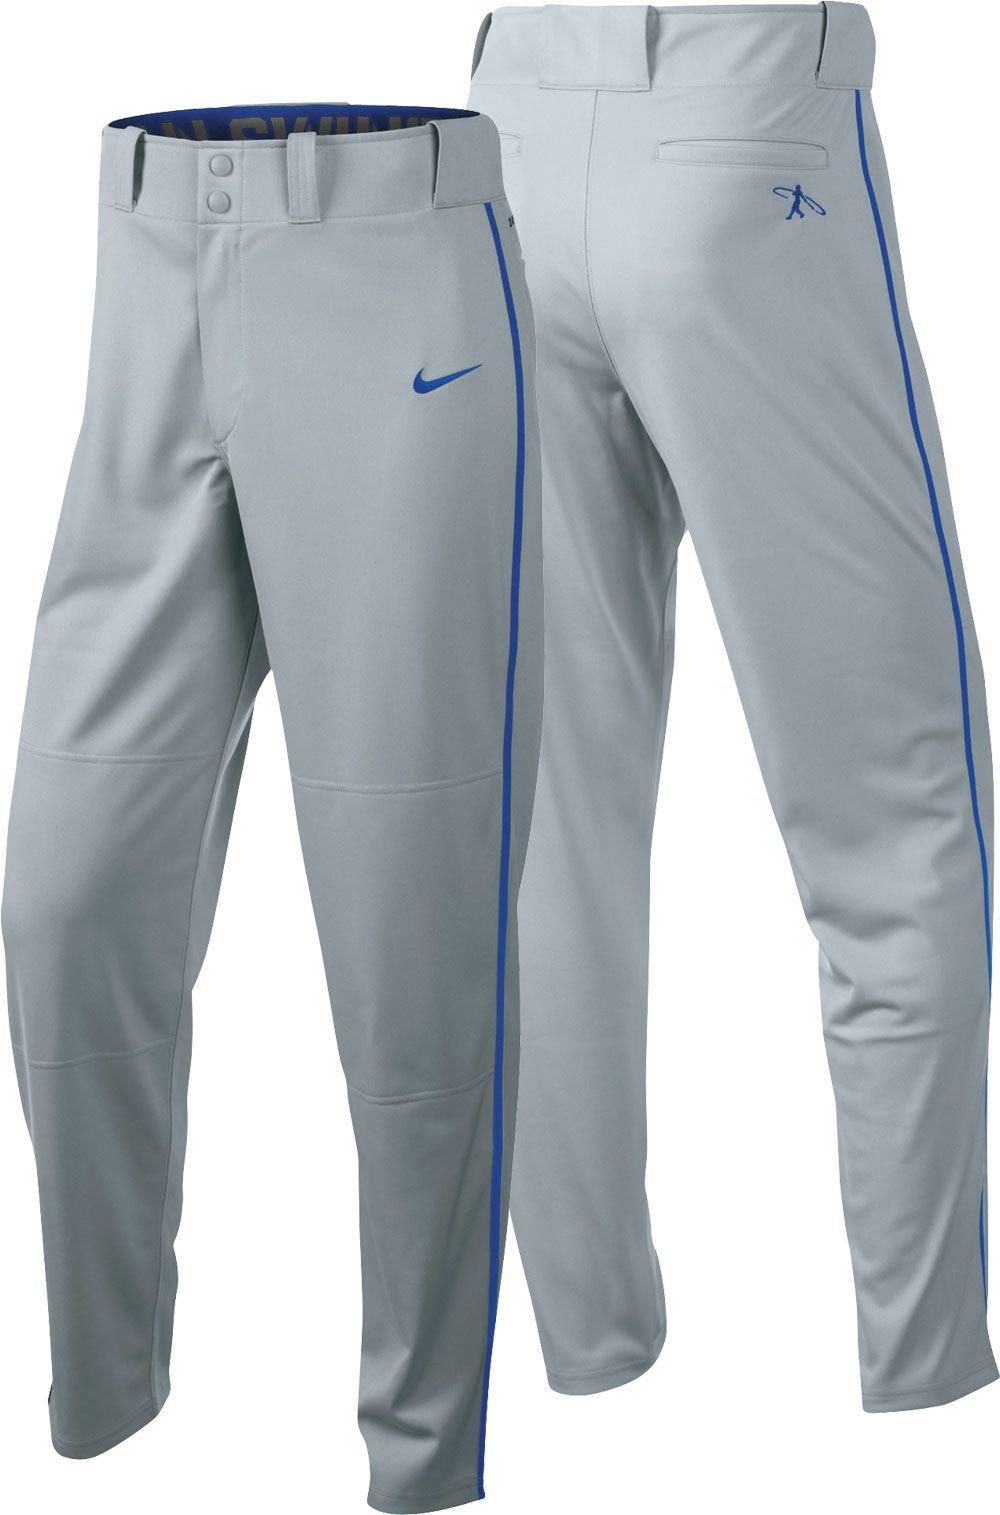 Nike Boys Swingman Dri-FIT Piped Baseball Pants (Grey/Royal, Large) by Nike (Image #1)